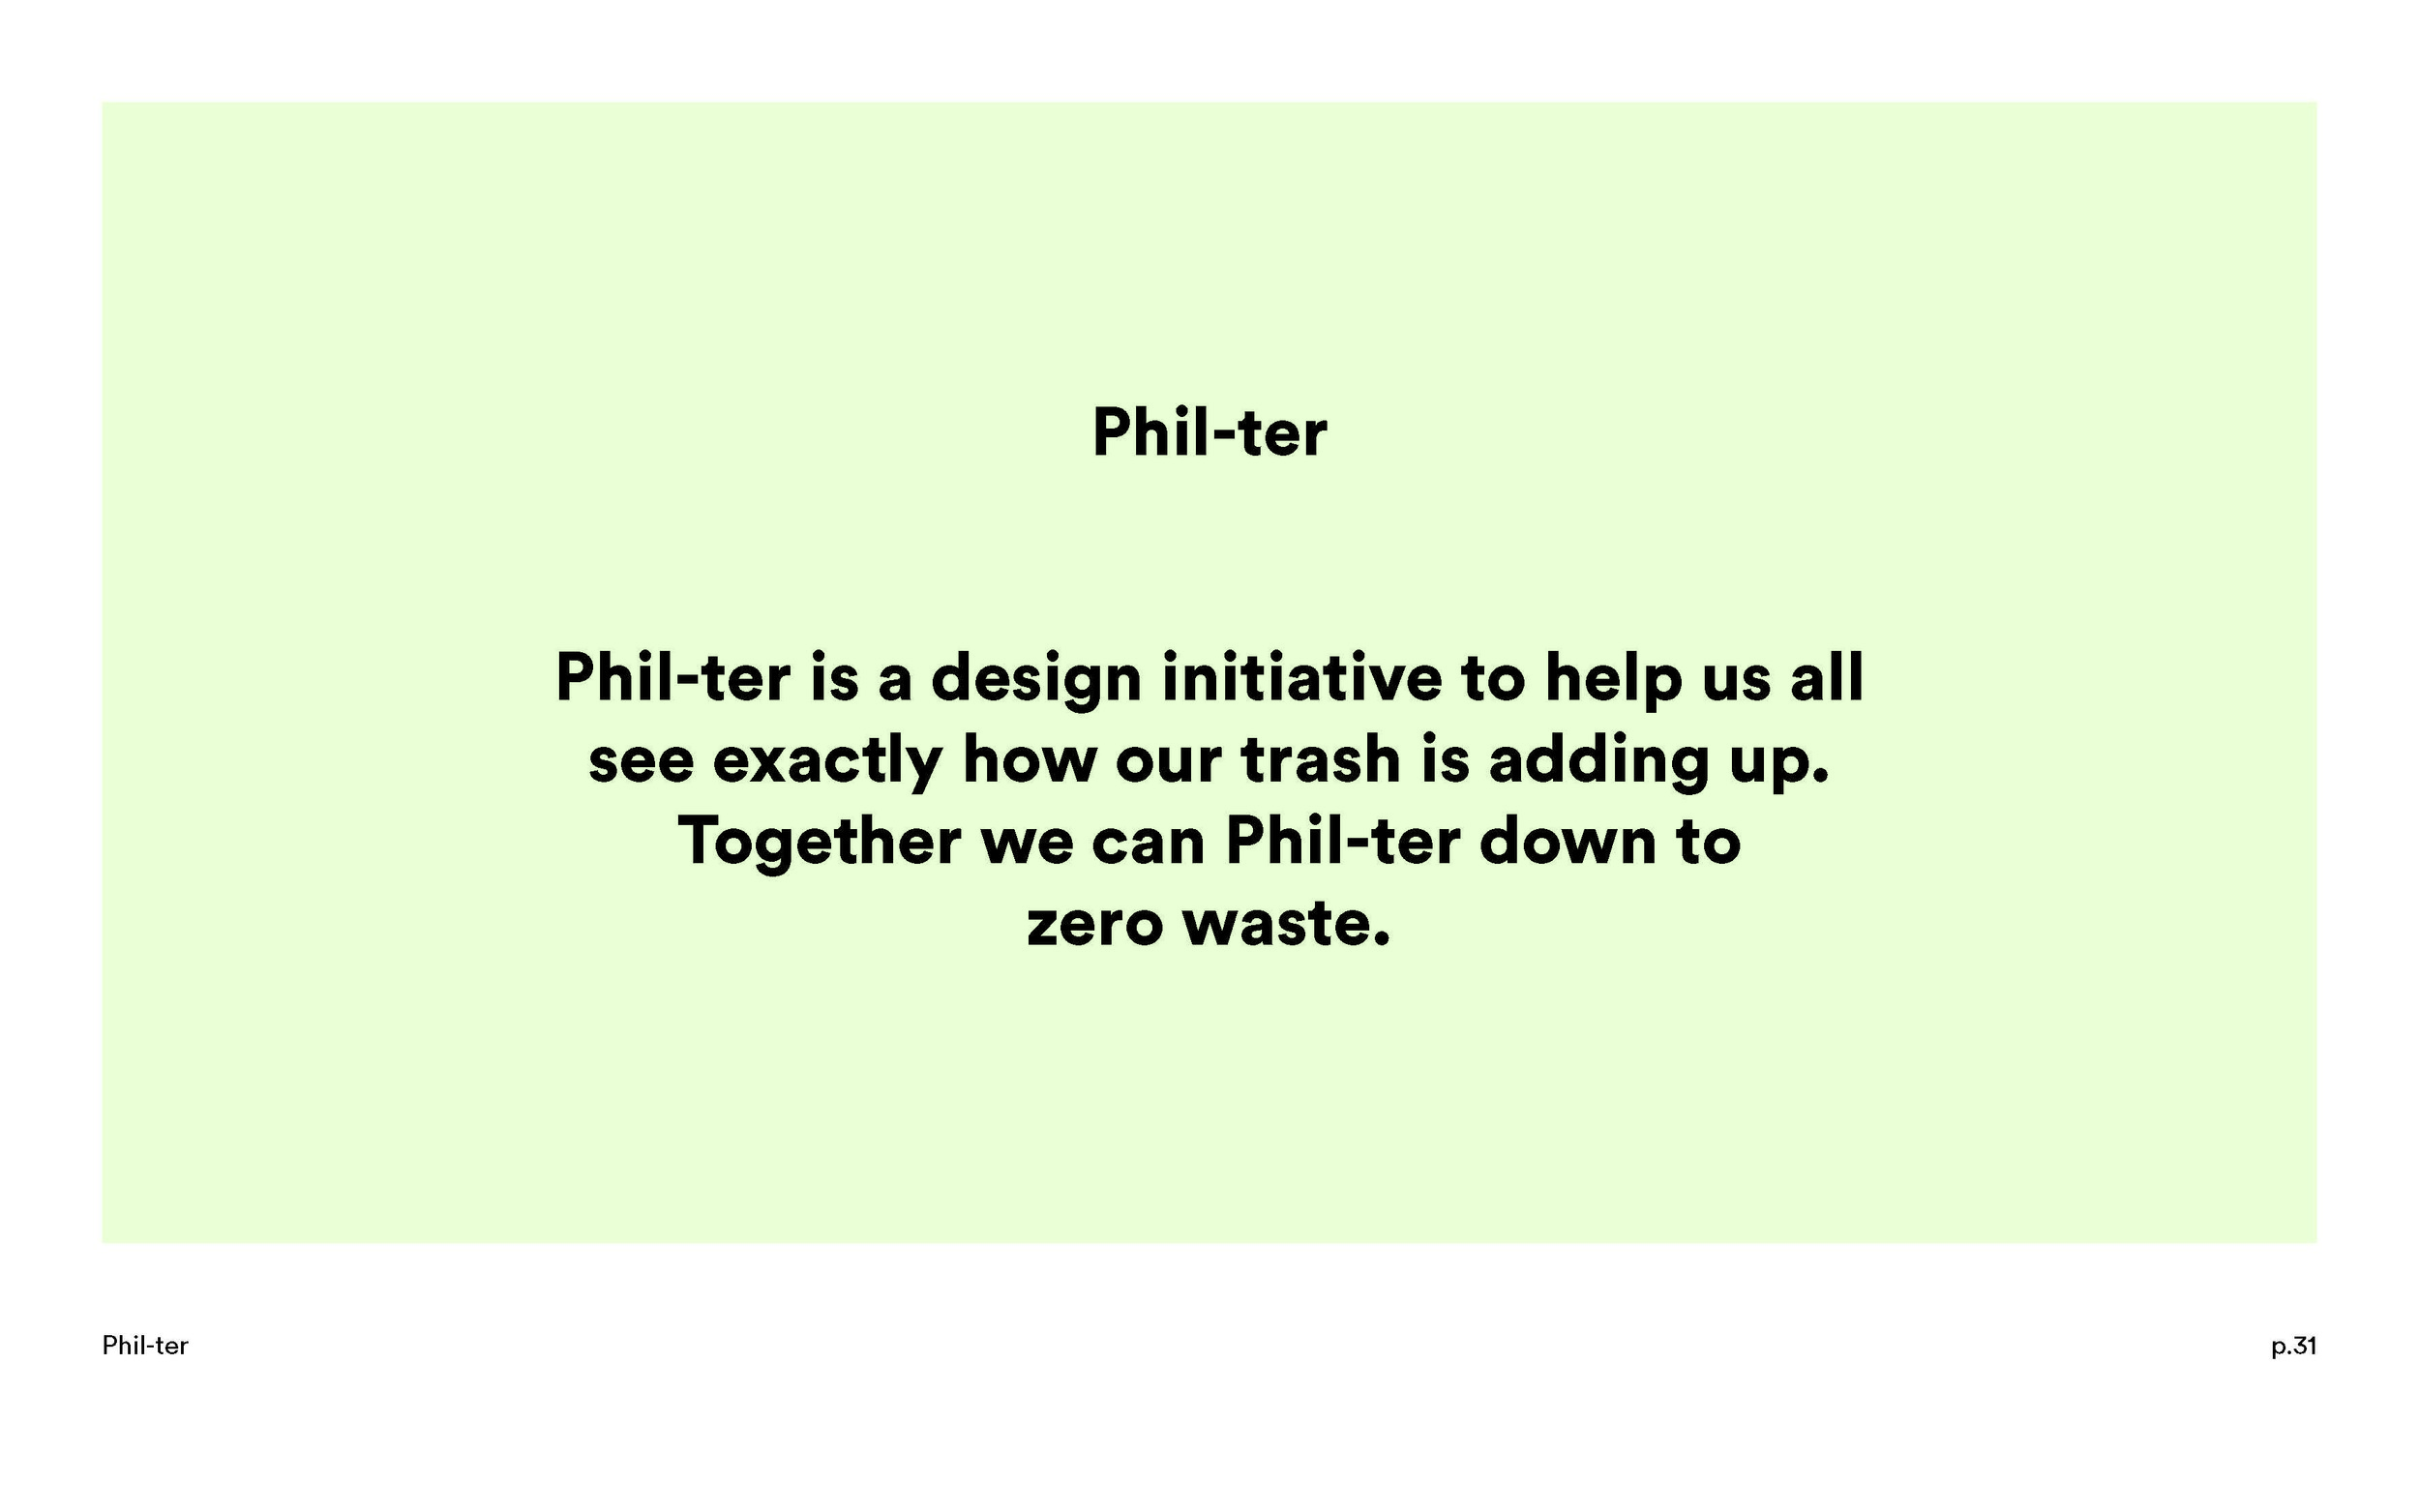 Phil-terFinalPresentation_页面_31.jpg